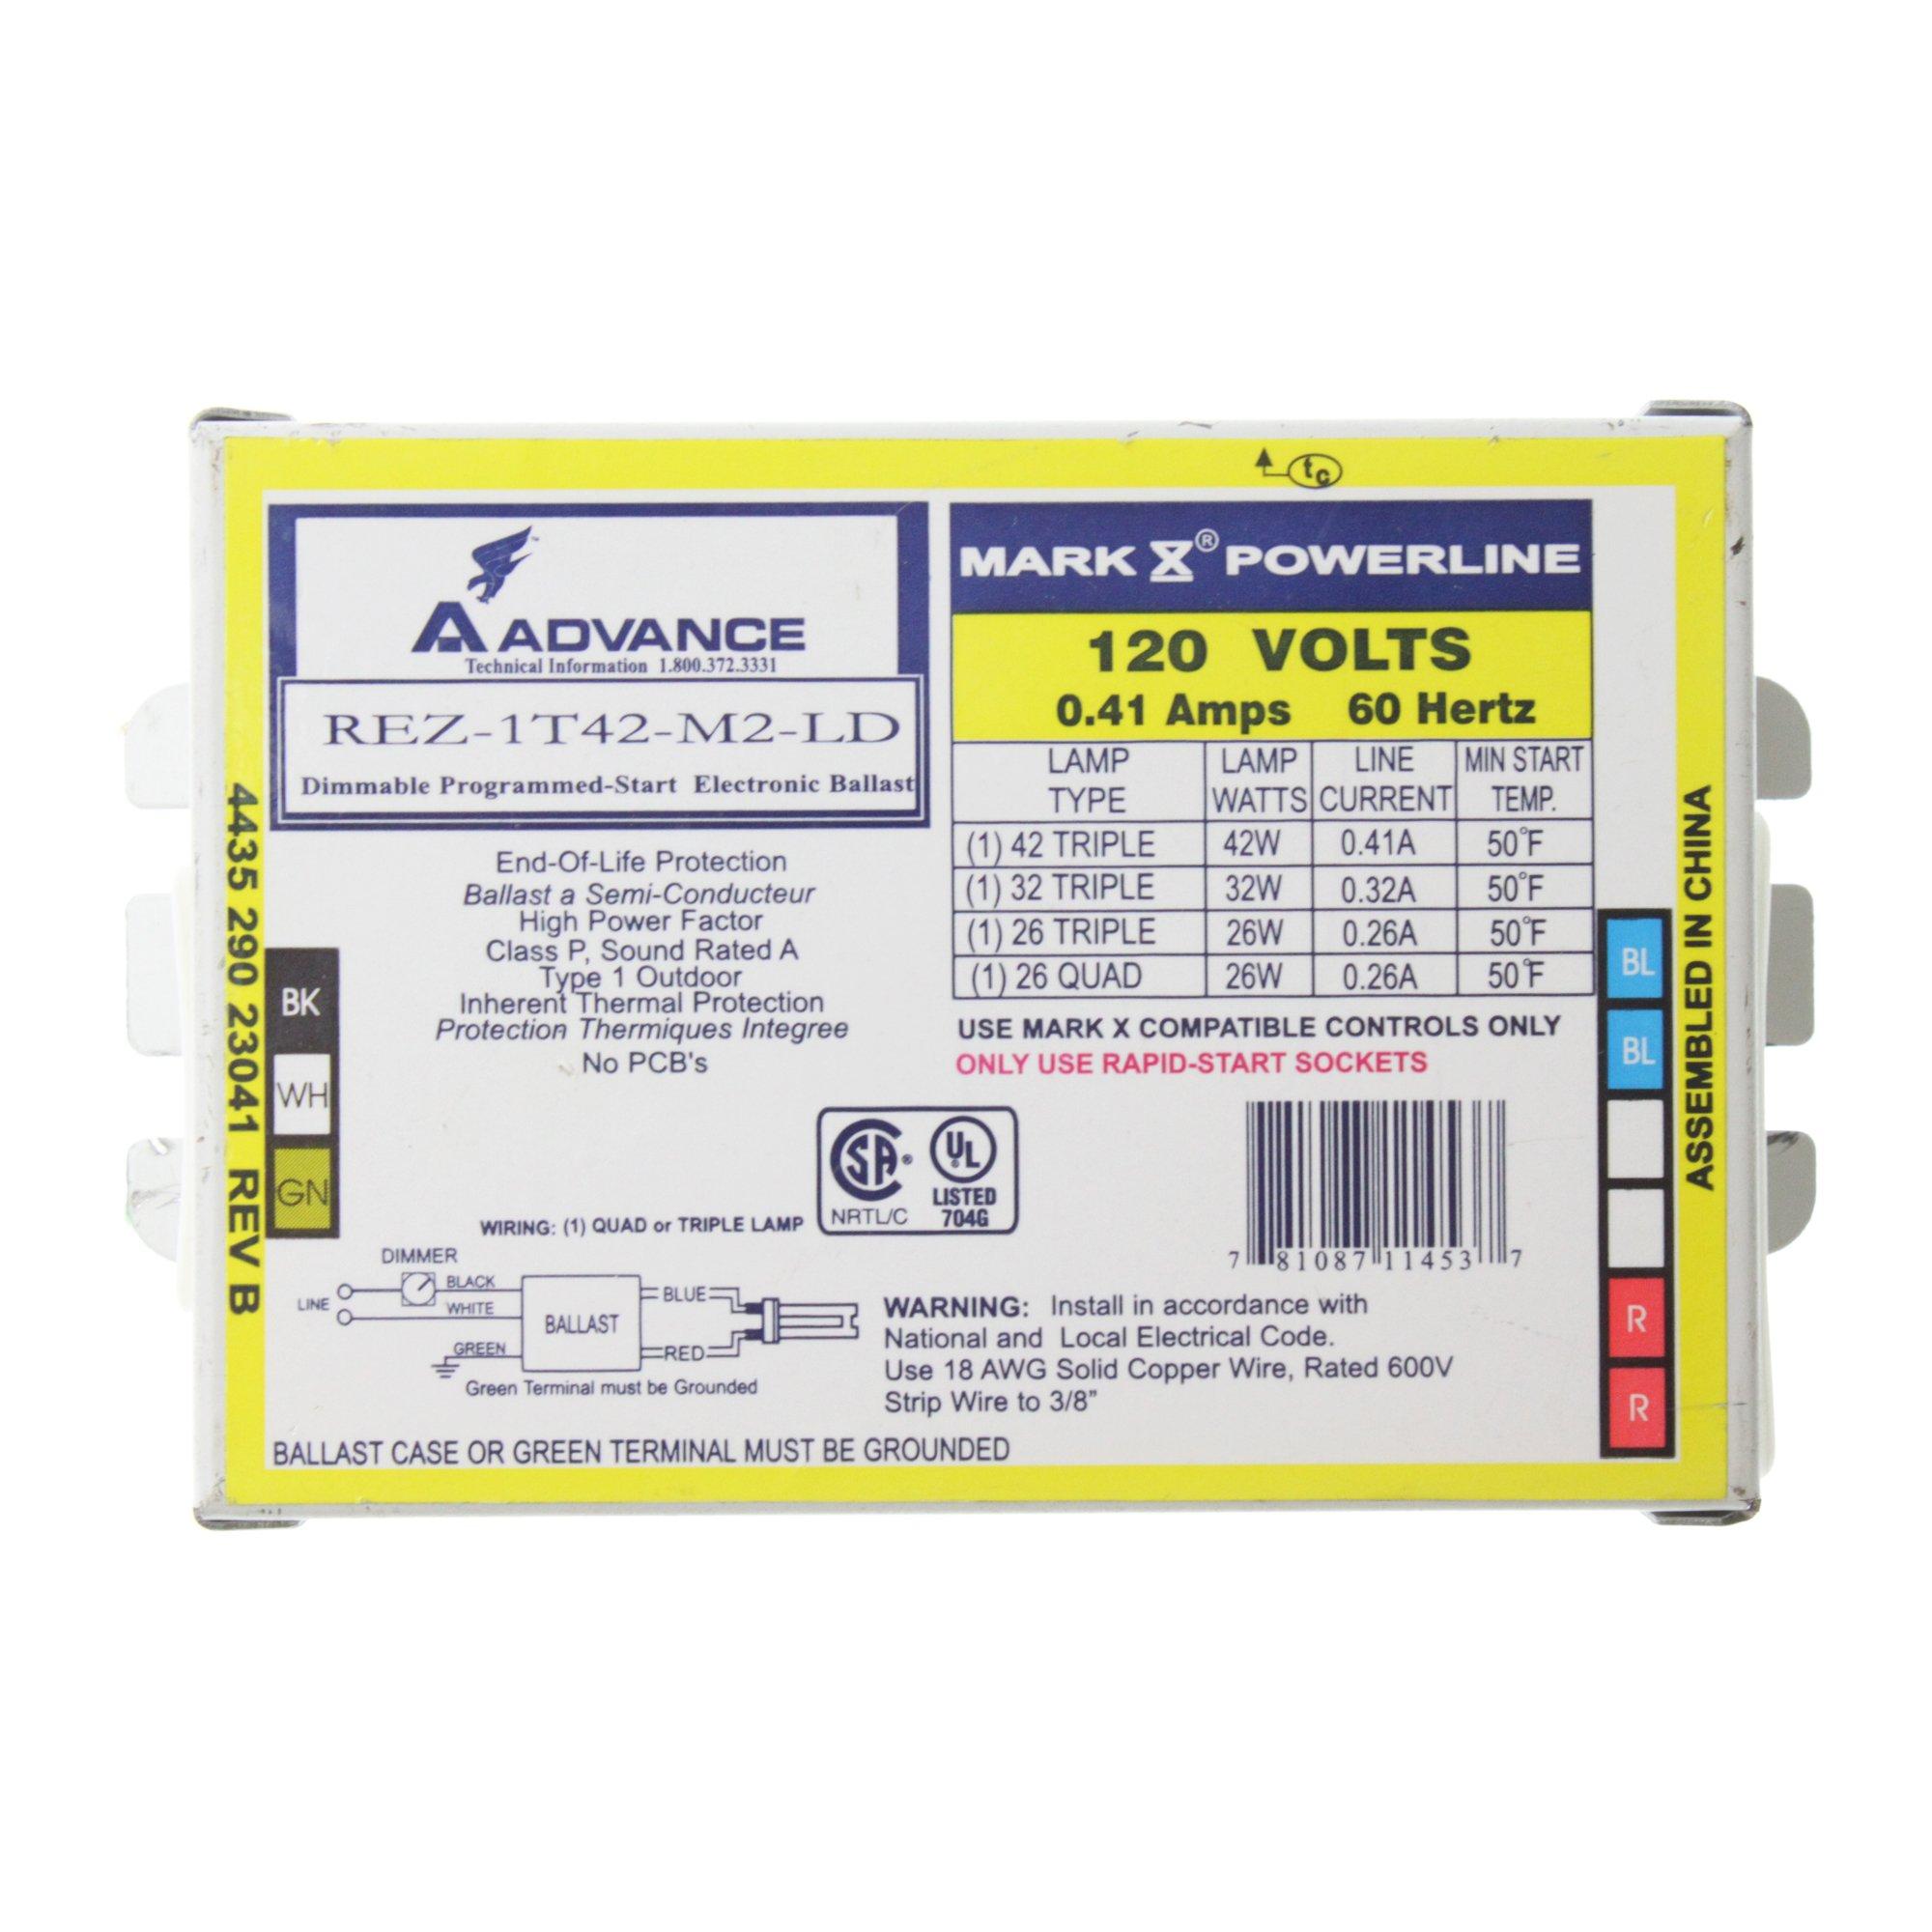 Advance Ballasts REX-1T42-M2-LD Dimmable CFL Ballast, 1-Lamp, 42W Triple, 120V